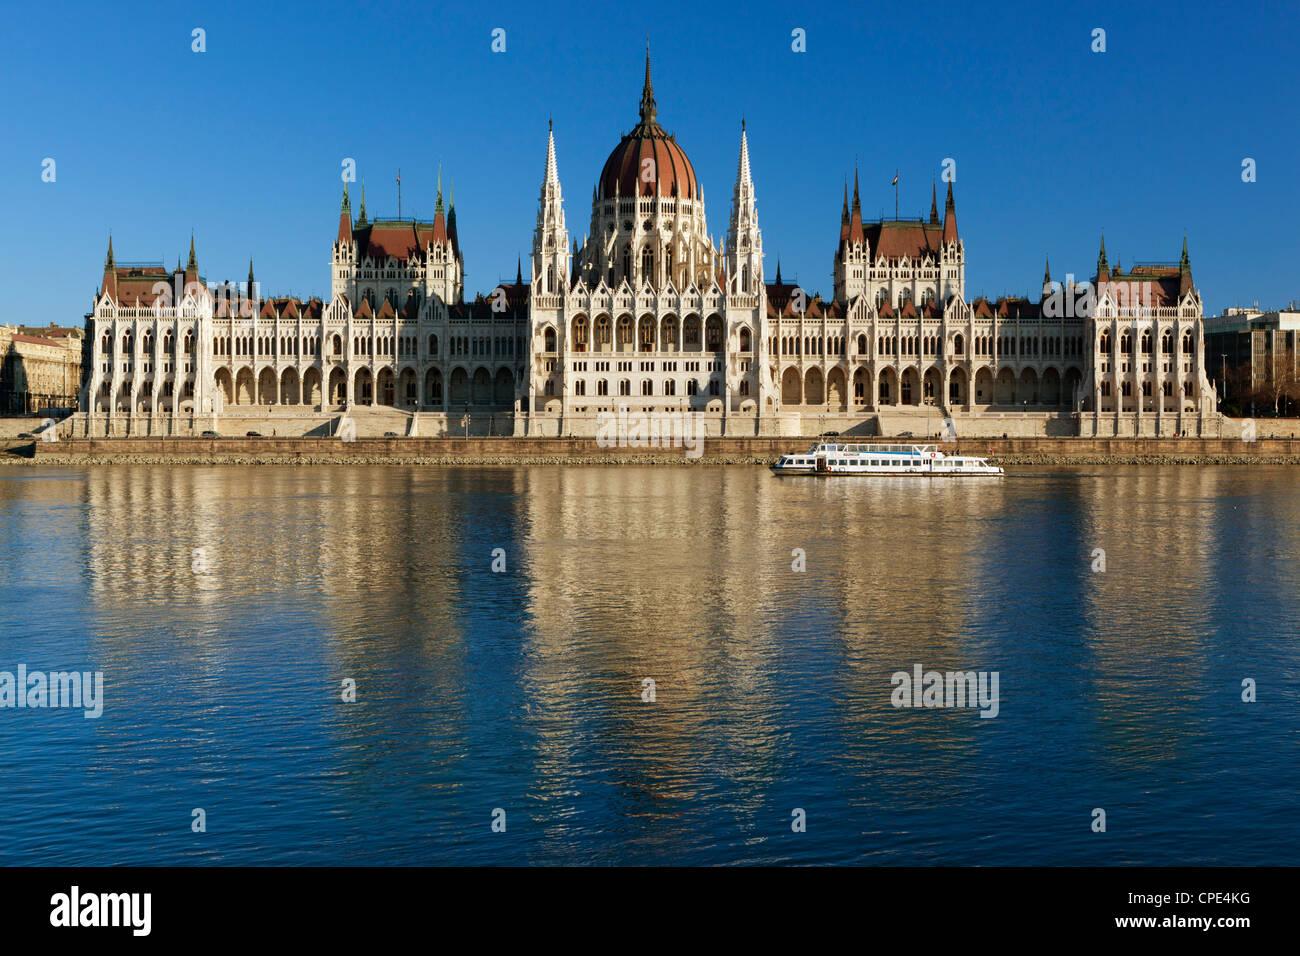 Das Parlament (Orszaghaz) über Donau bei Sonnenuntergang, UNESCO-Weltkulturerbe, Budapest, Ungarn, Europa Stockbild